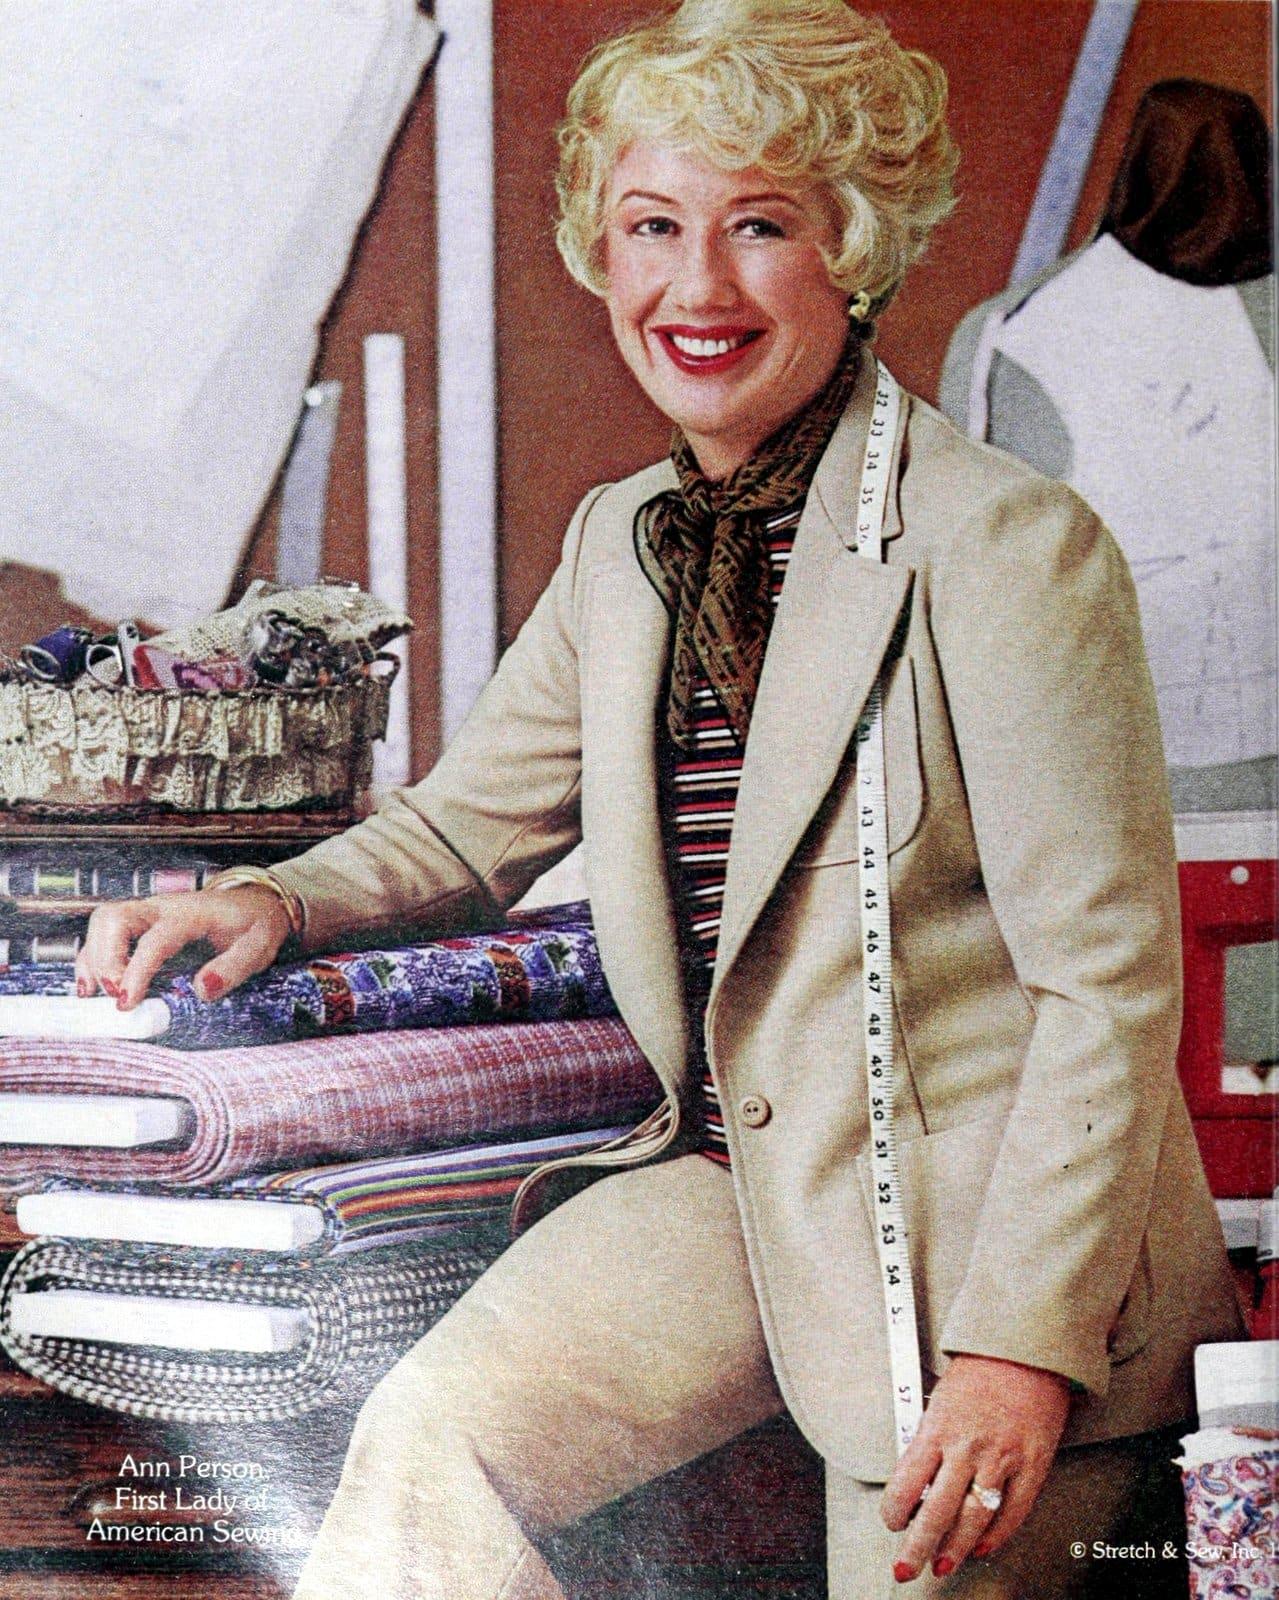 Retro 1970s suits for women (1976)